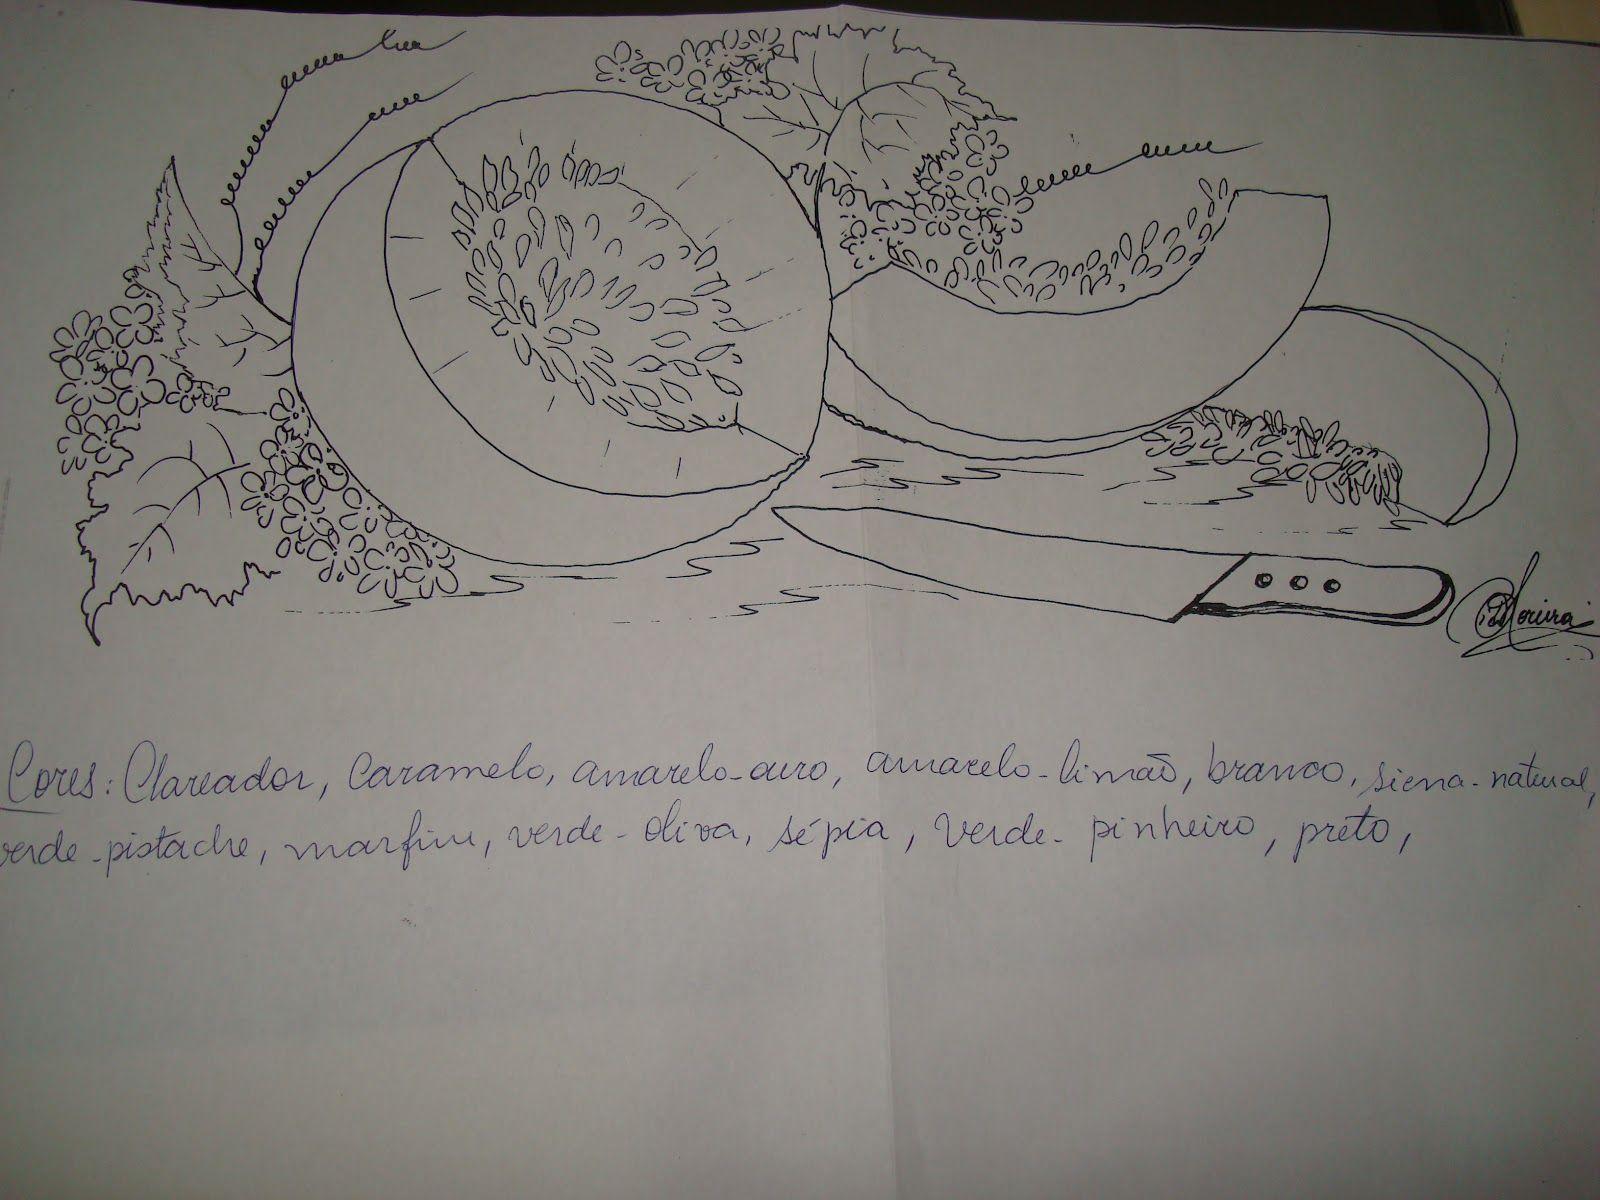 Easy D Line Drawings : Melao risco.jpg 1600×1200 journal drawing painting